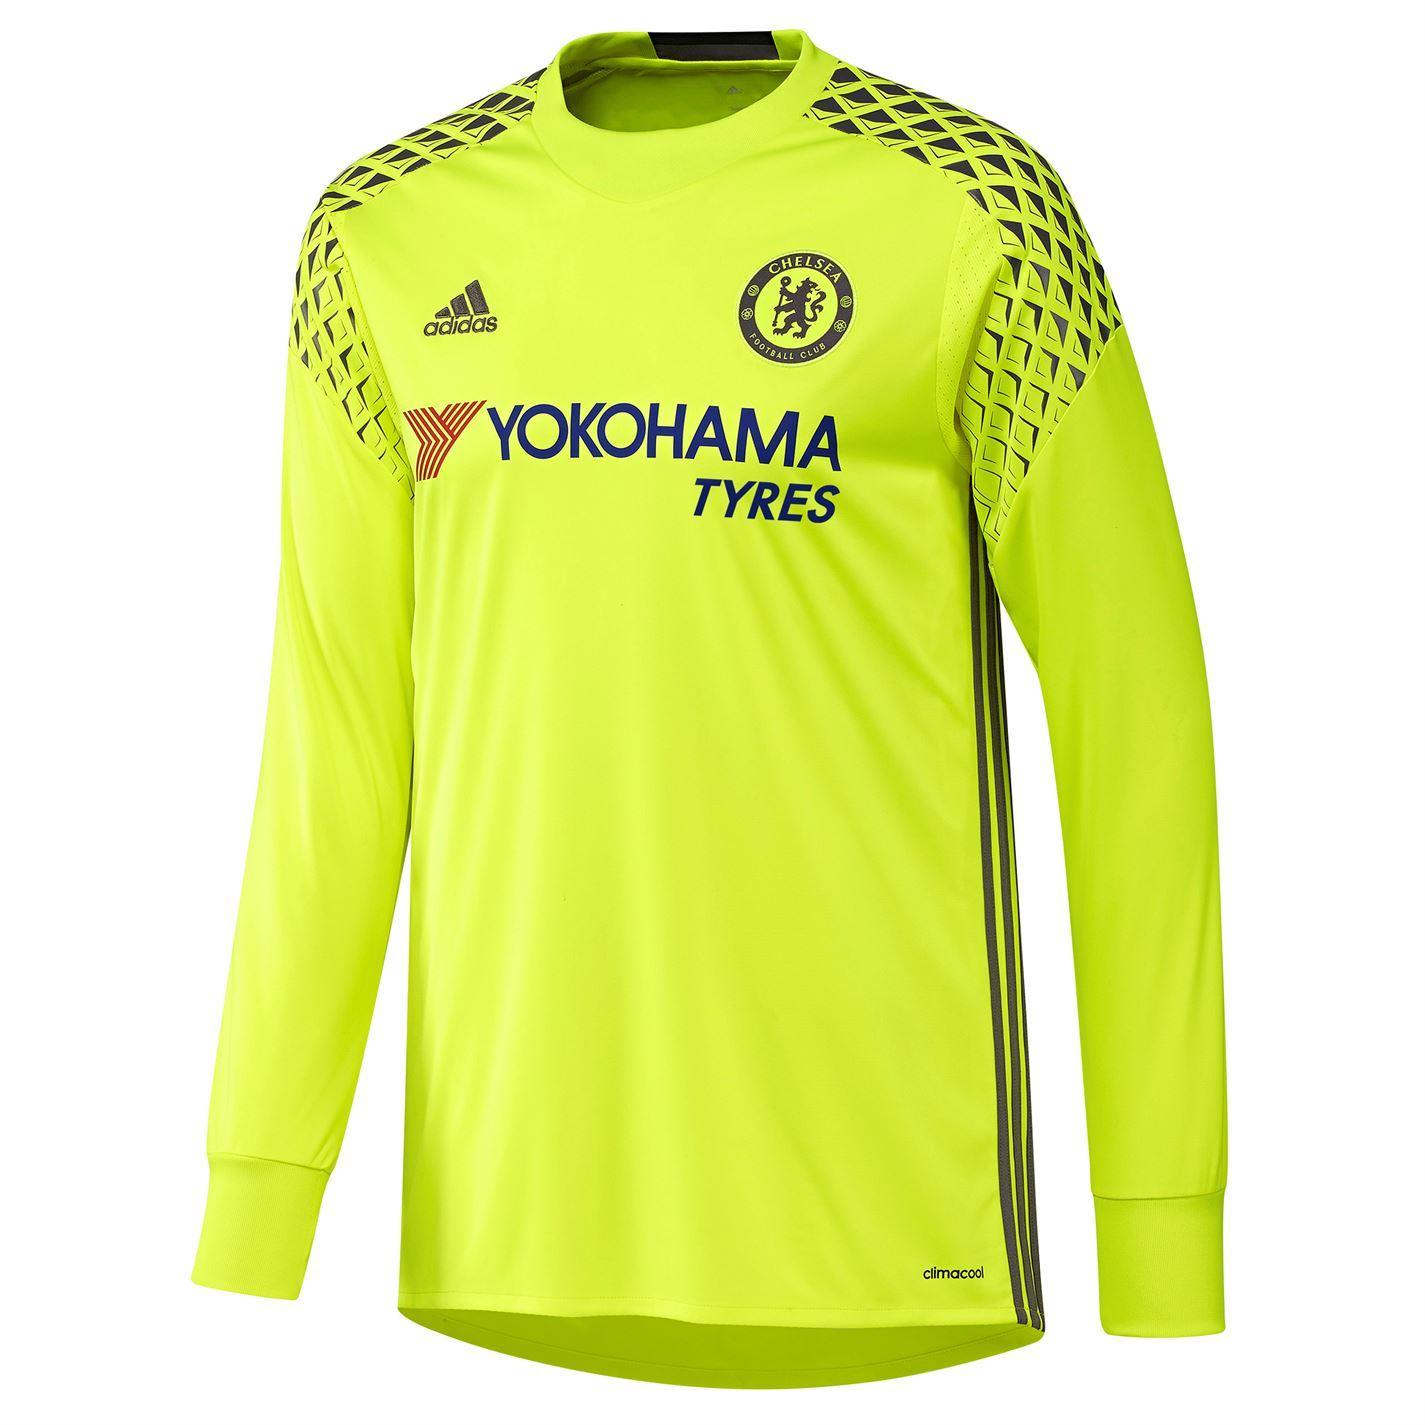 8abe88b87 ... Adidas Chelsea FC Home Goalkeeper Jersey 2016 2017 Mens Yellow Football  Soccer